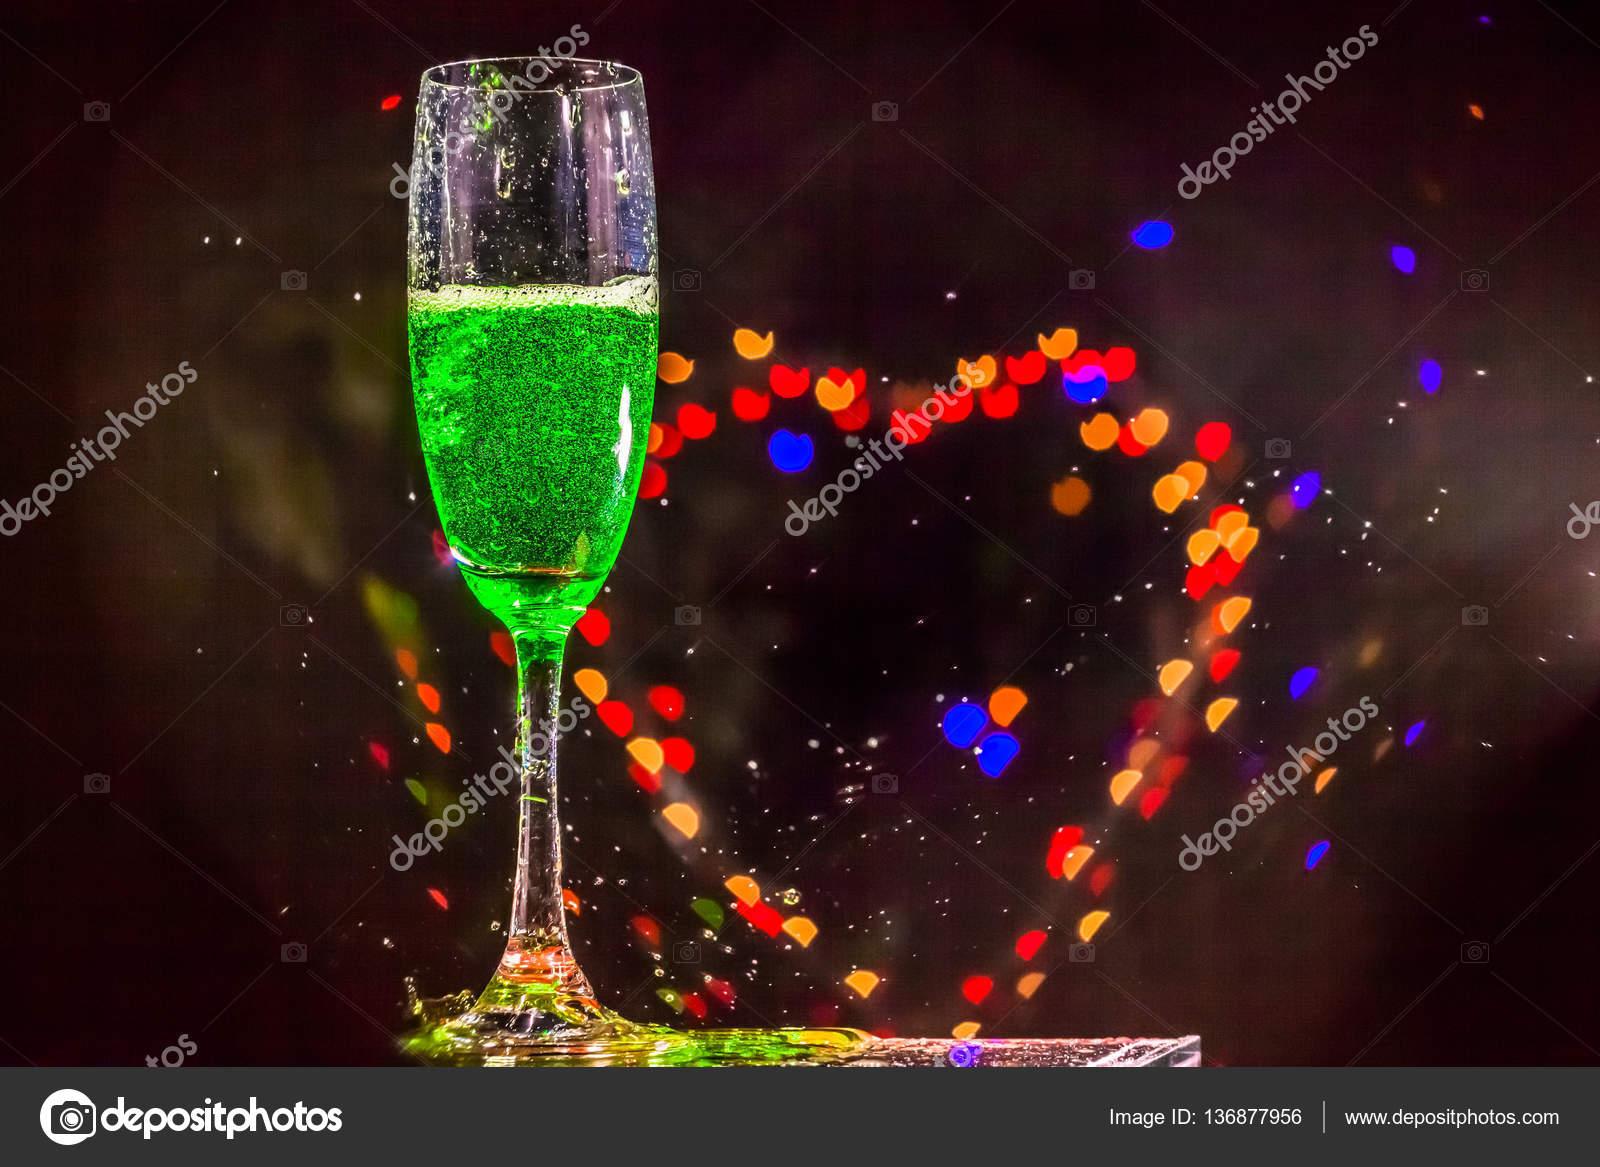 Bubble Herz in Getränk — Stockfoto © thaisign #136877956